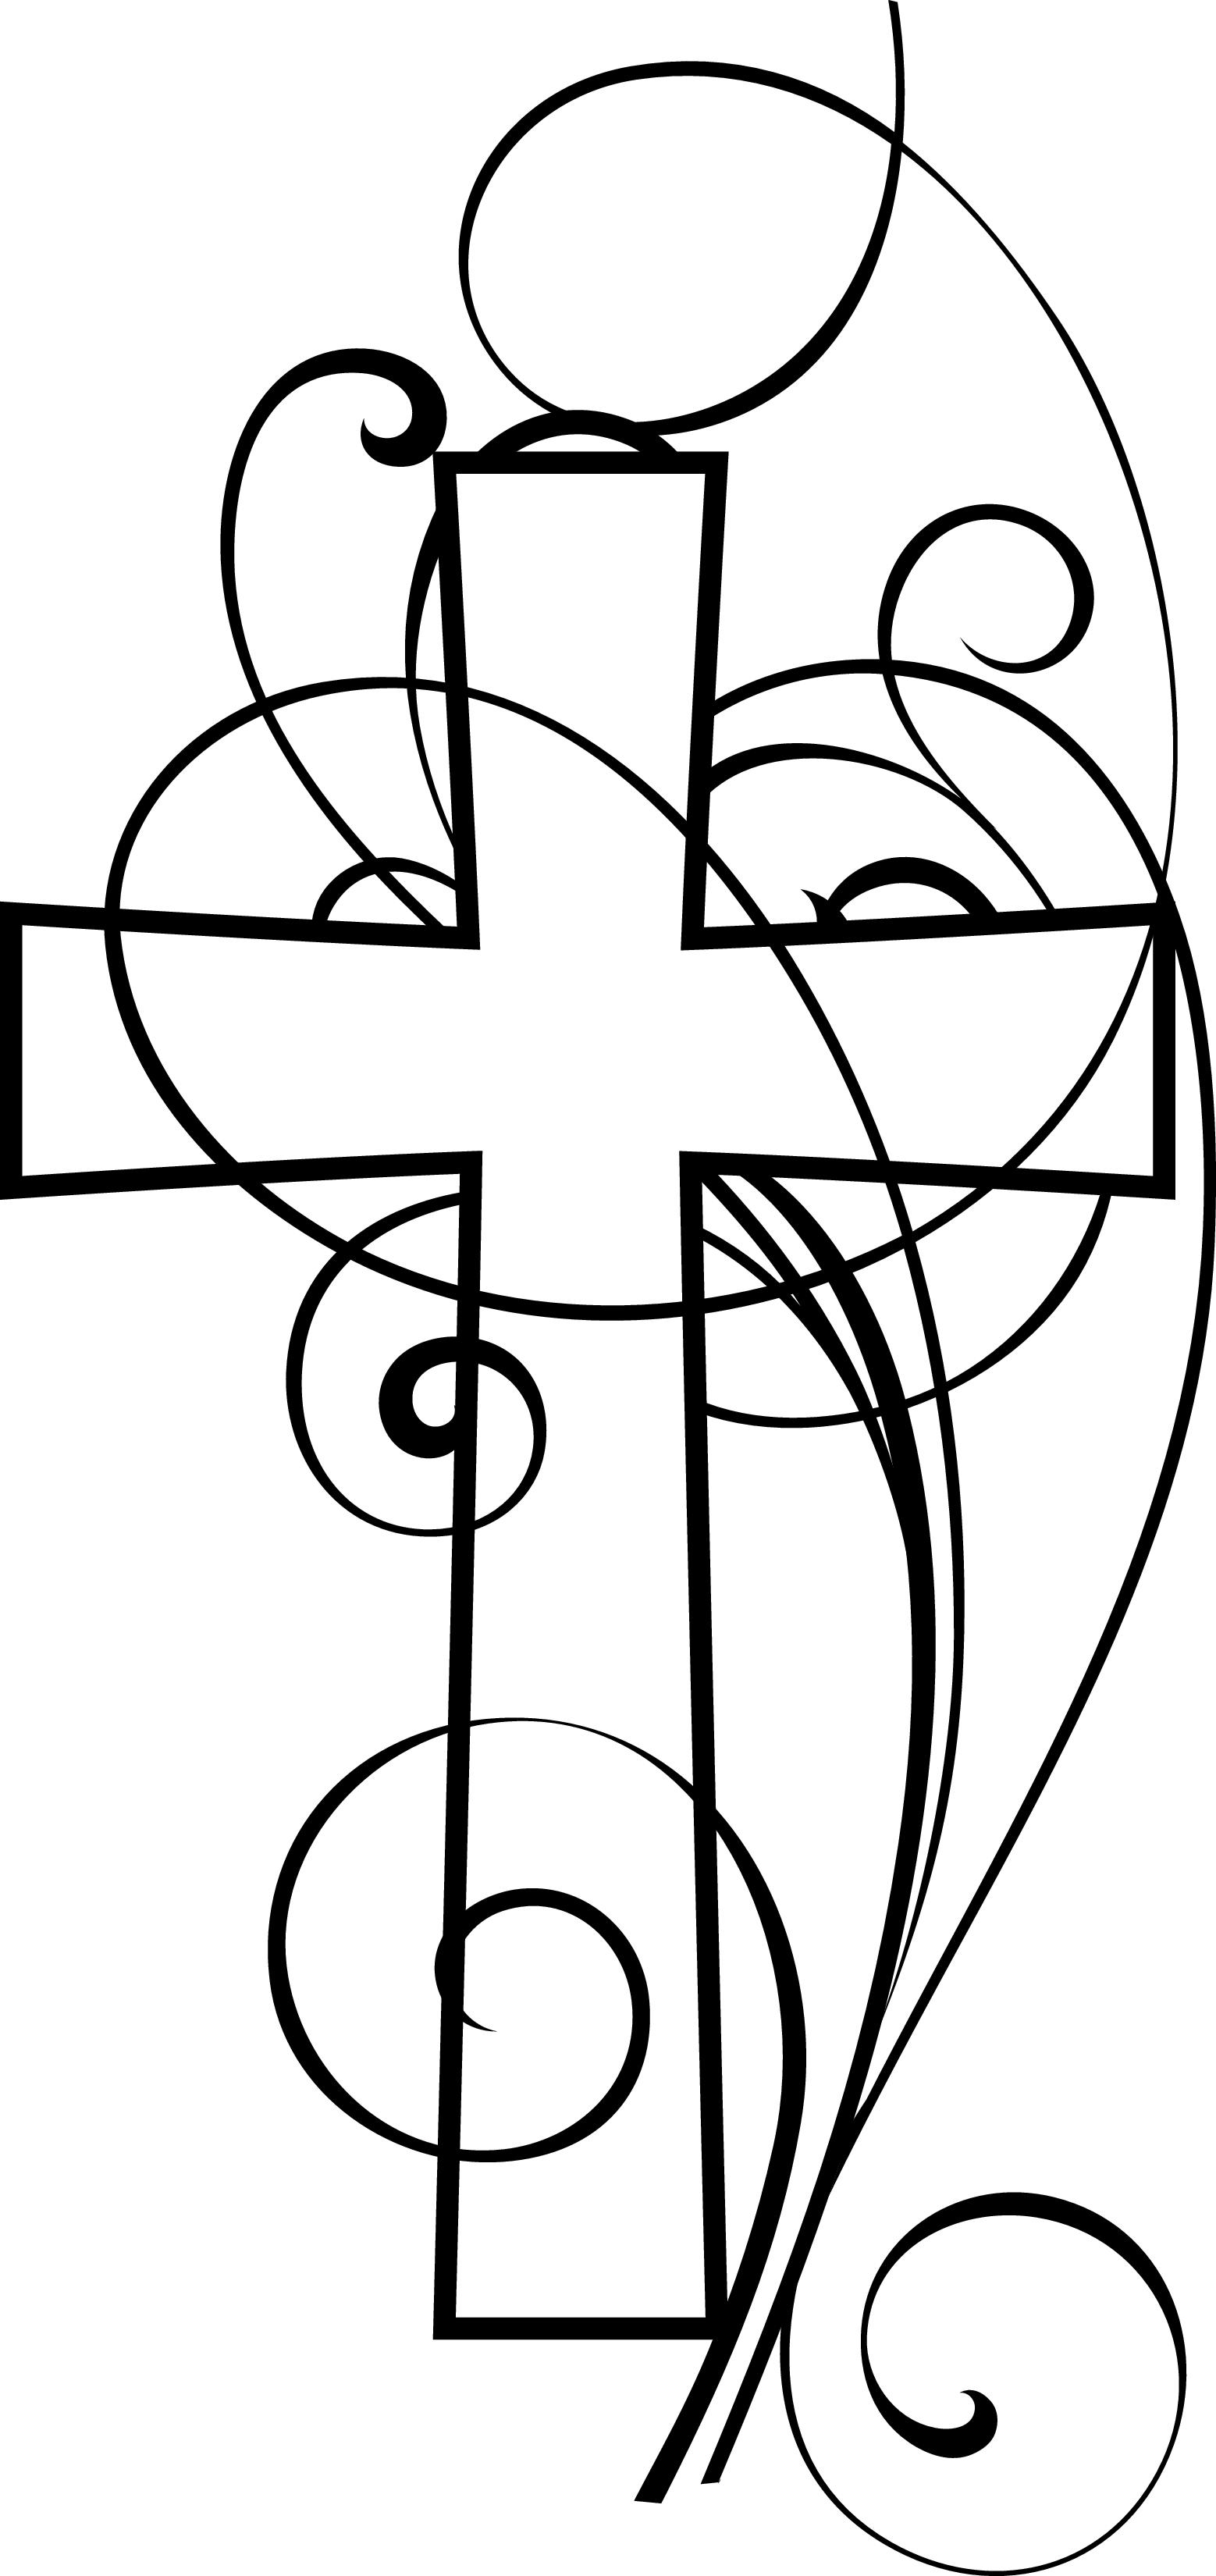 Free Christian Cross Clip Art Black and White